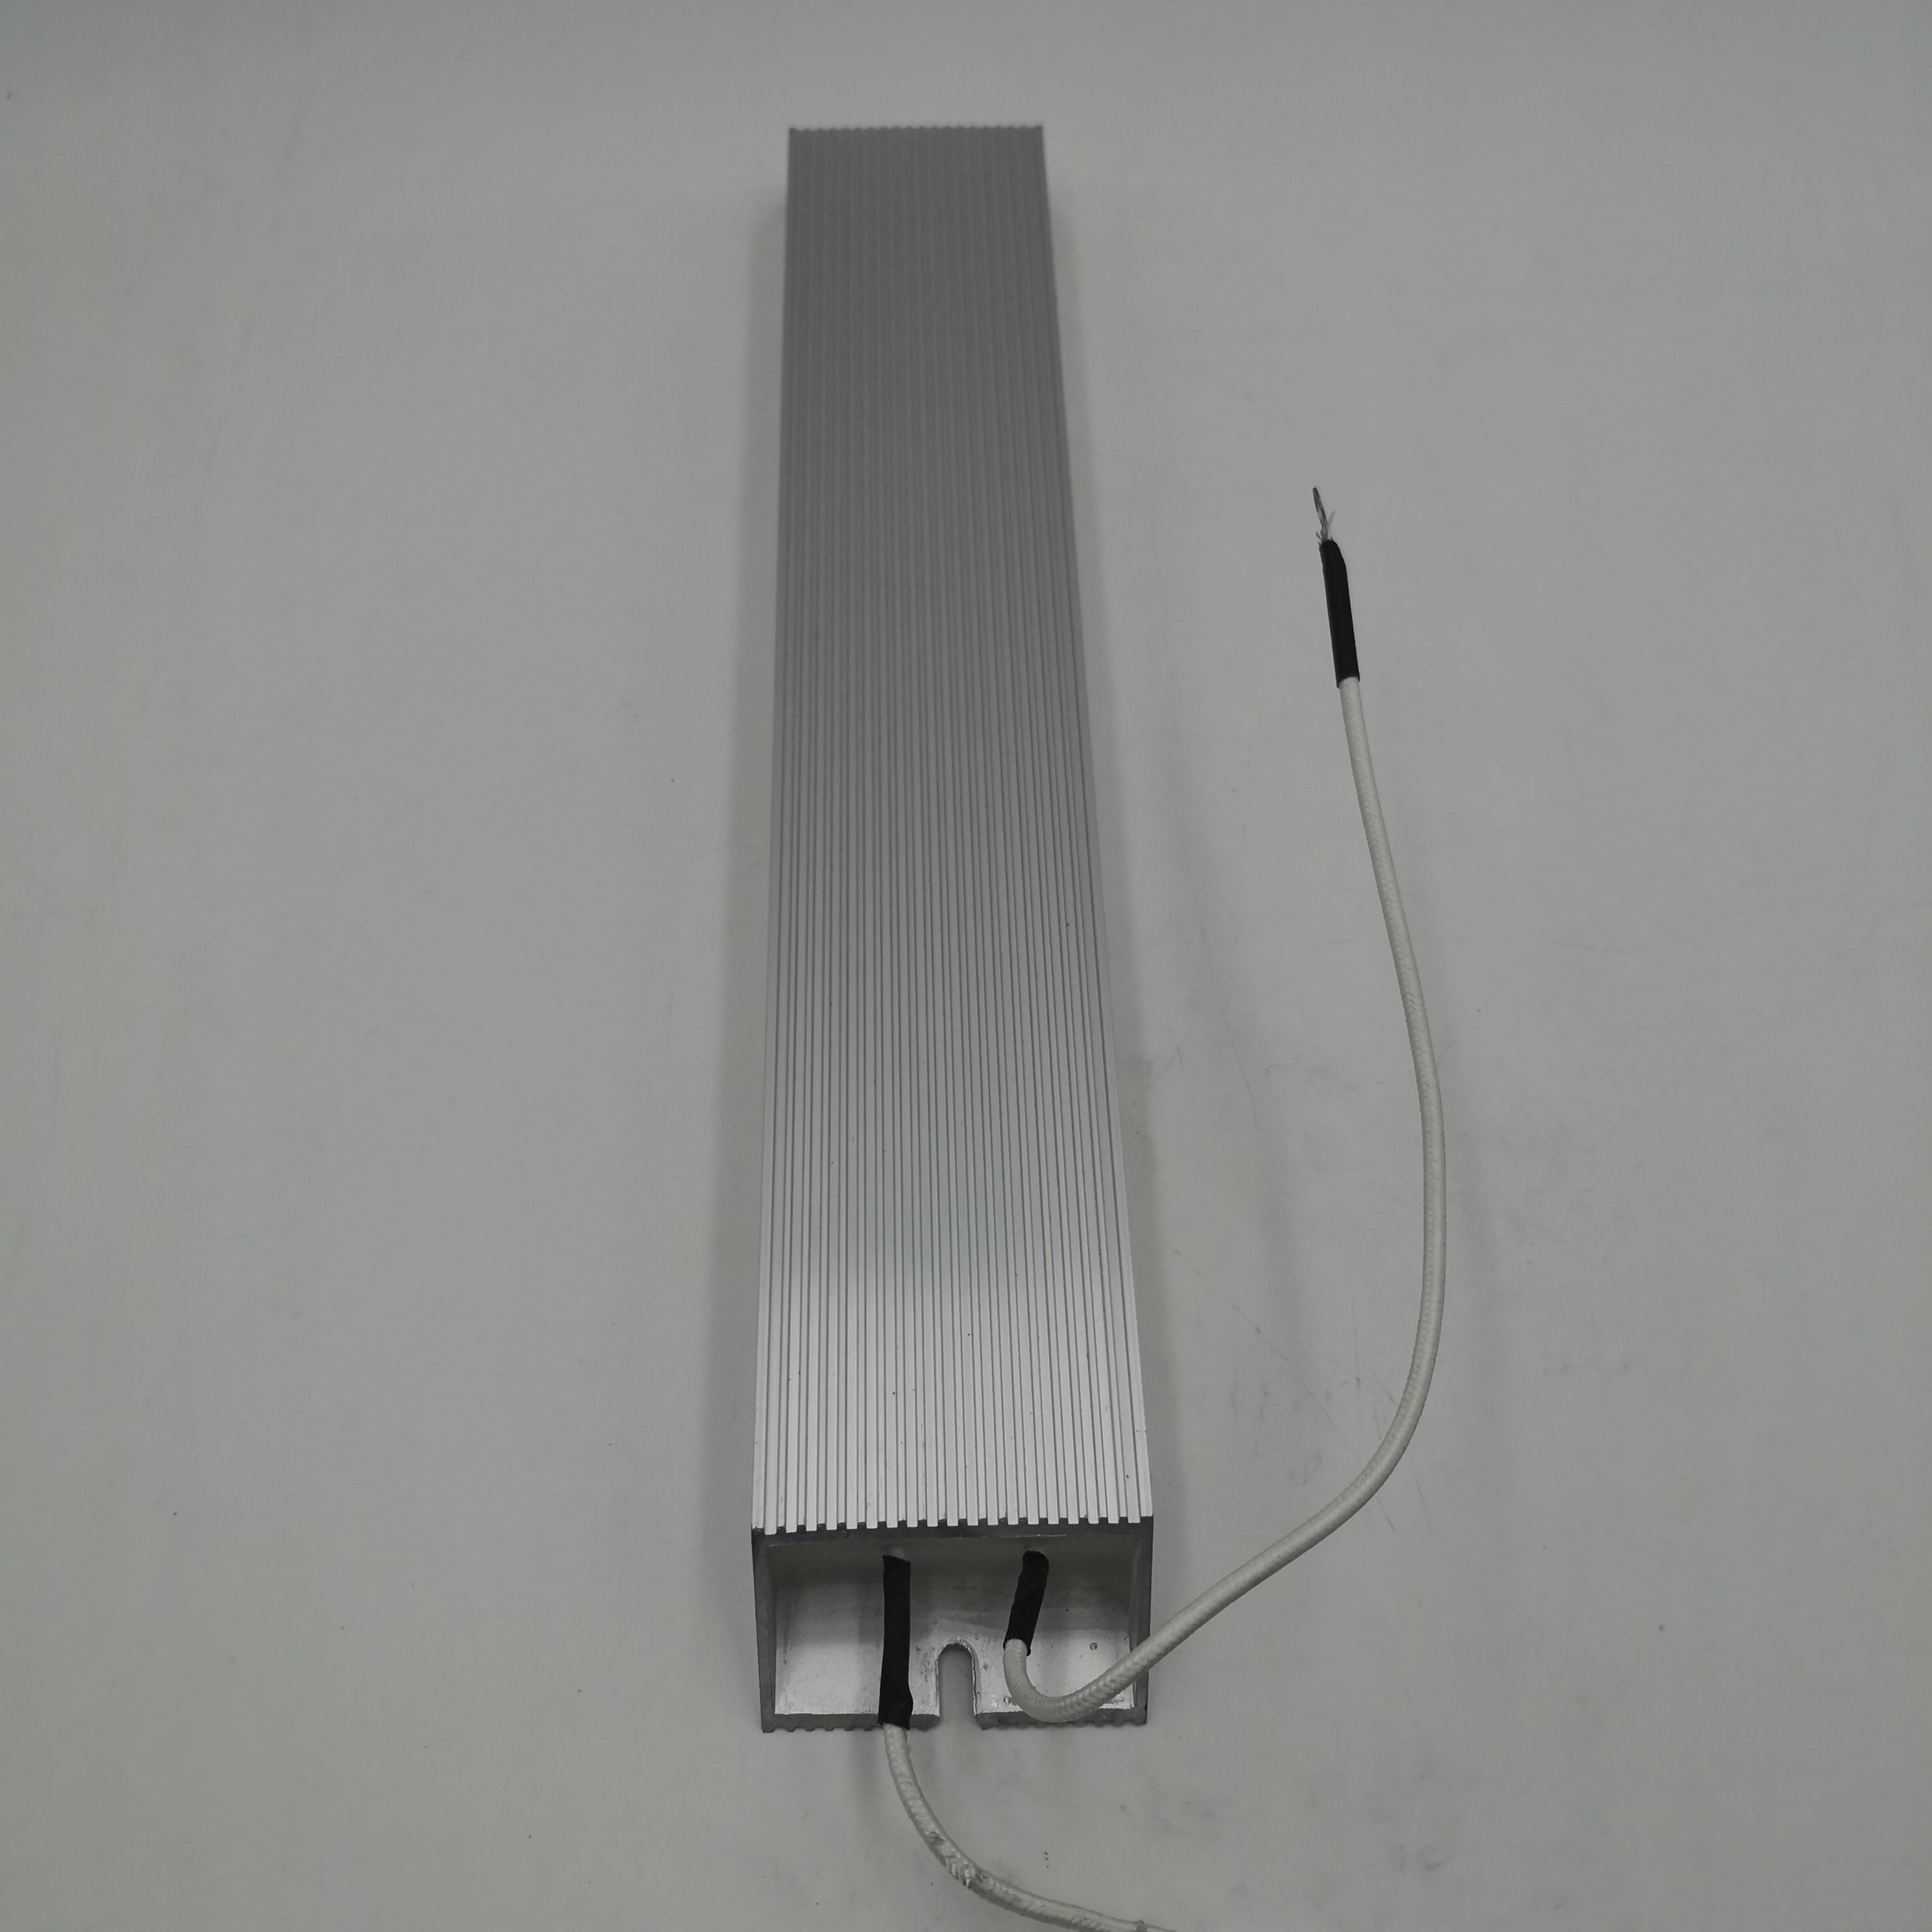 Braking Resistor for frequency inverter 2.2KW(VFD) 300W 100 OMG